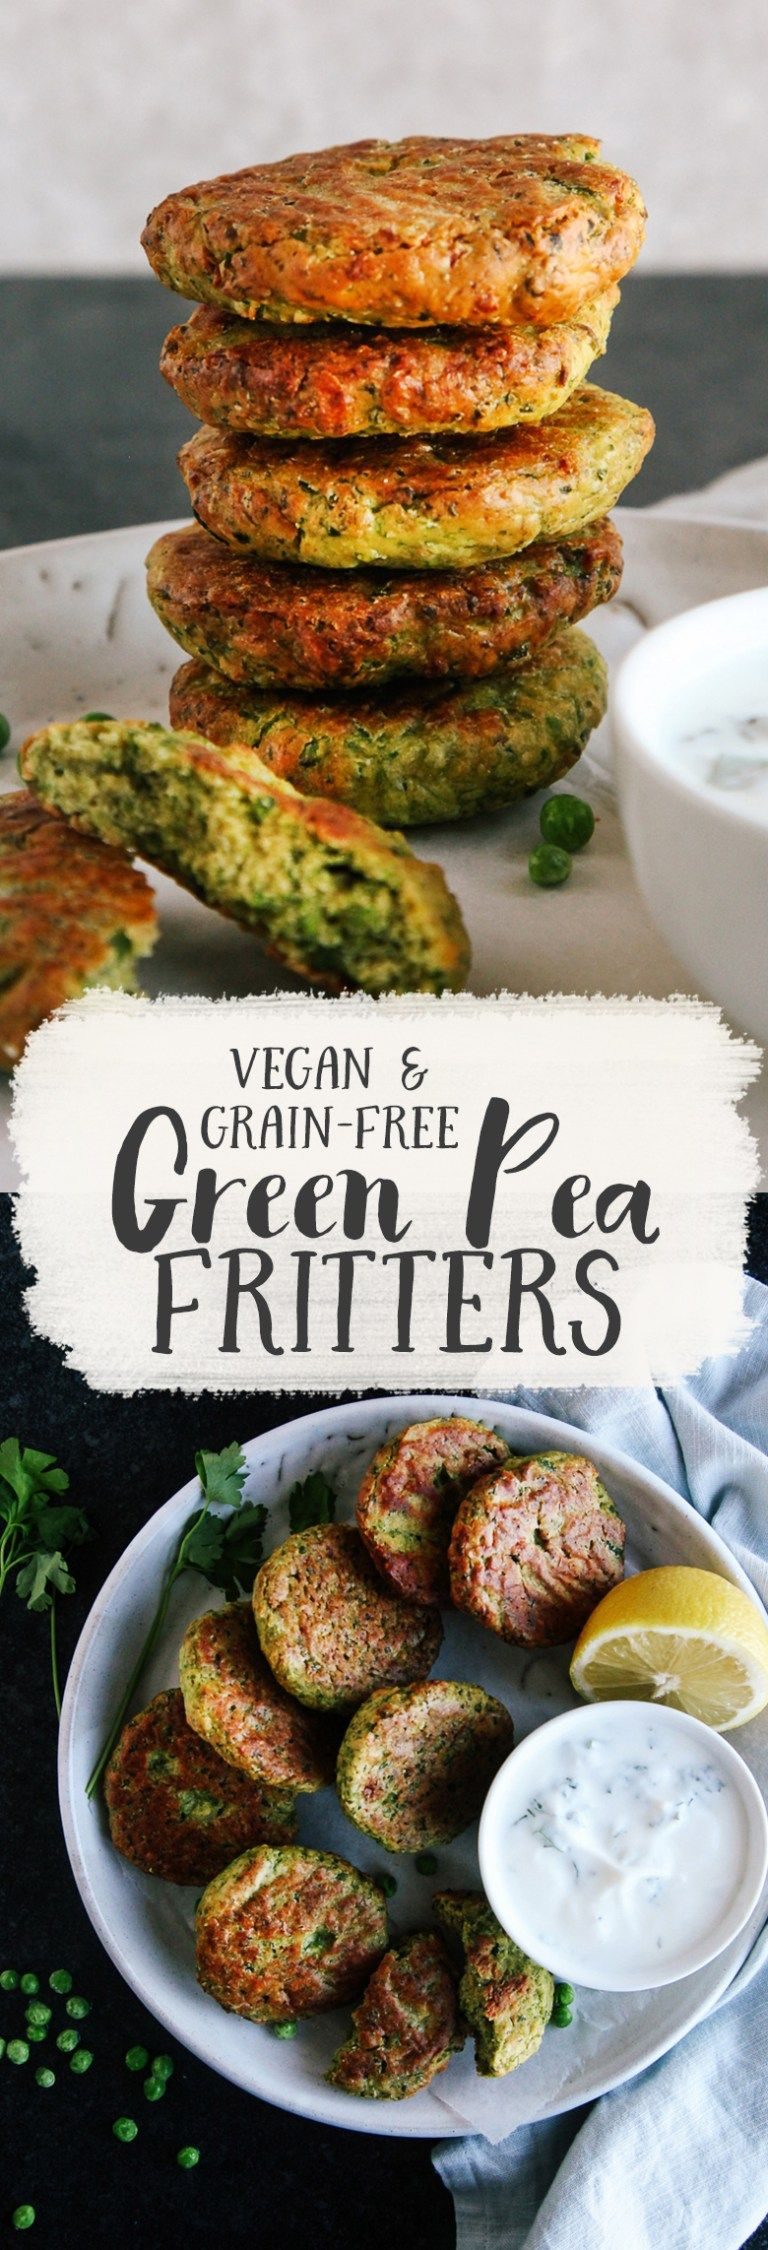 Green Pea Fritters Vegan Gf